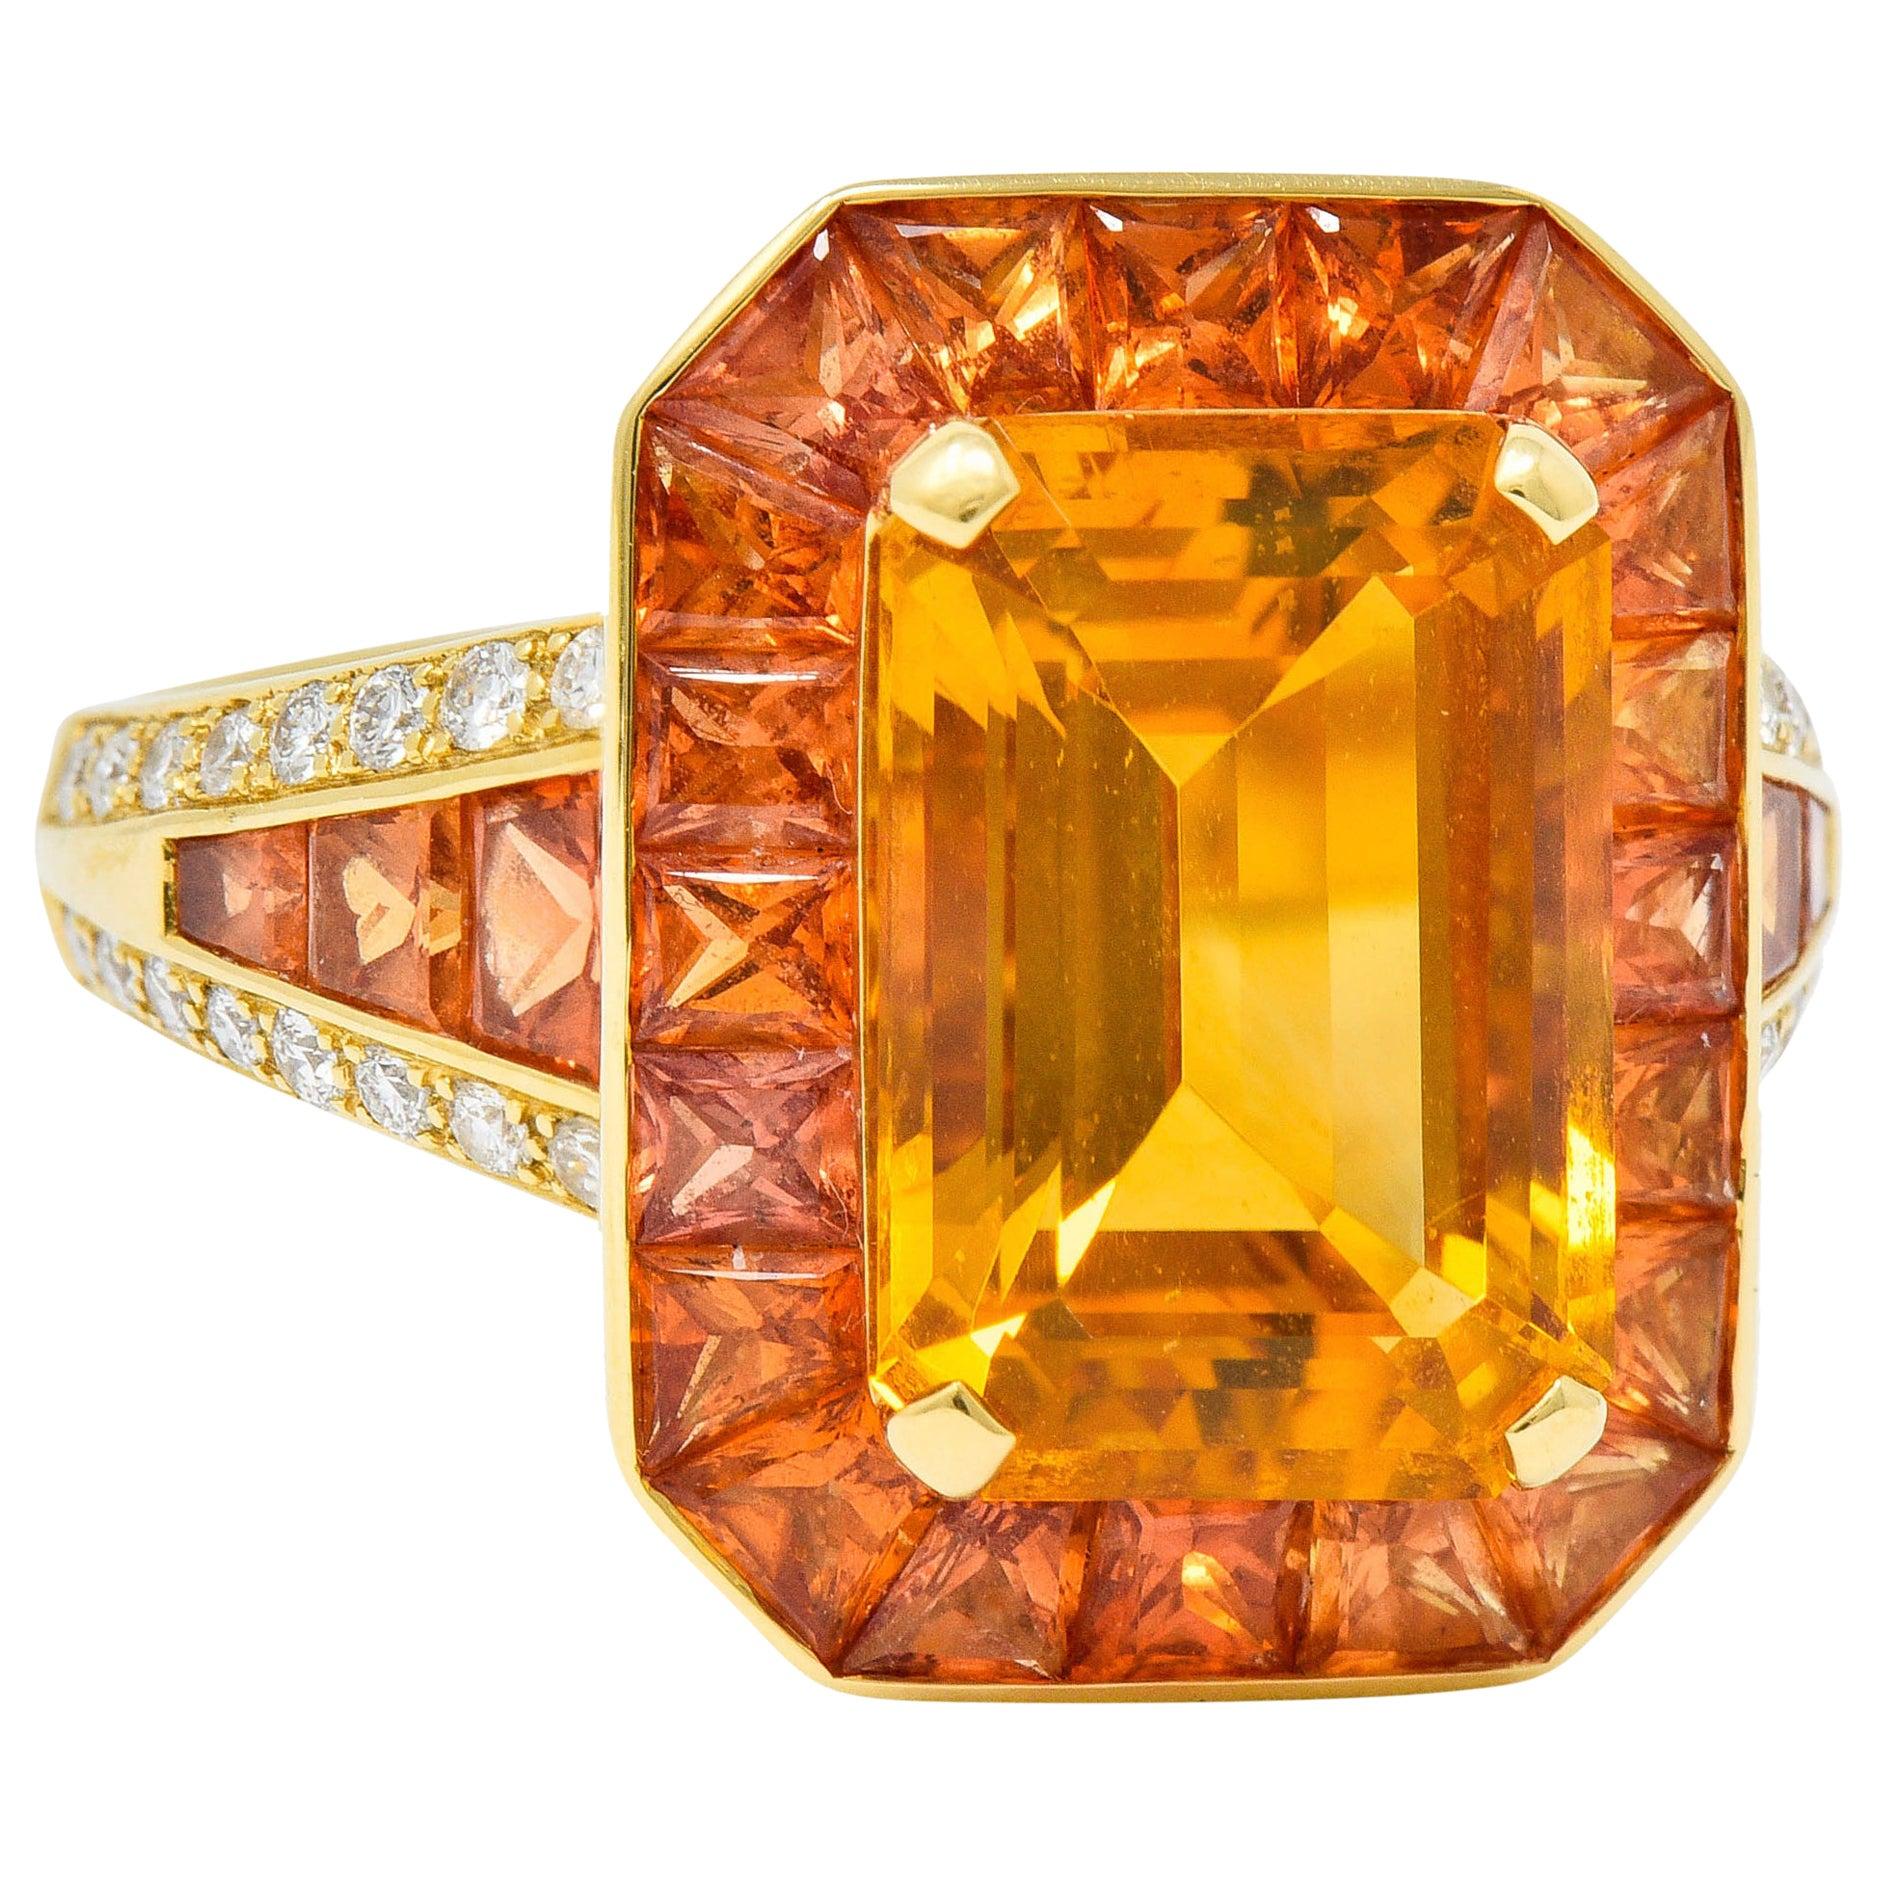 Roberto Coin 6.80 Carats Citrine Sapphire Diamond 18 Karat Gold Cocktail Ring